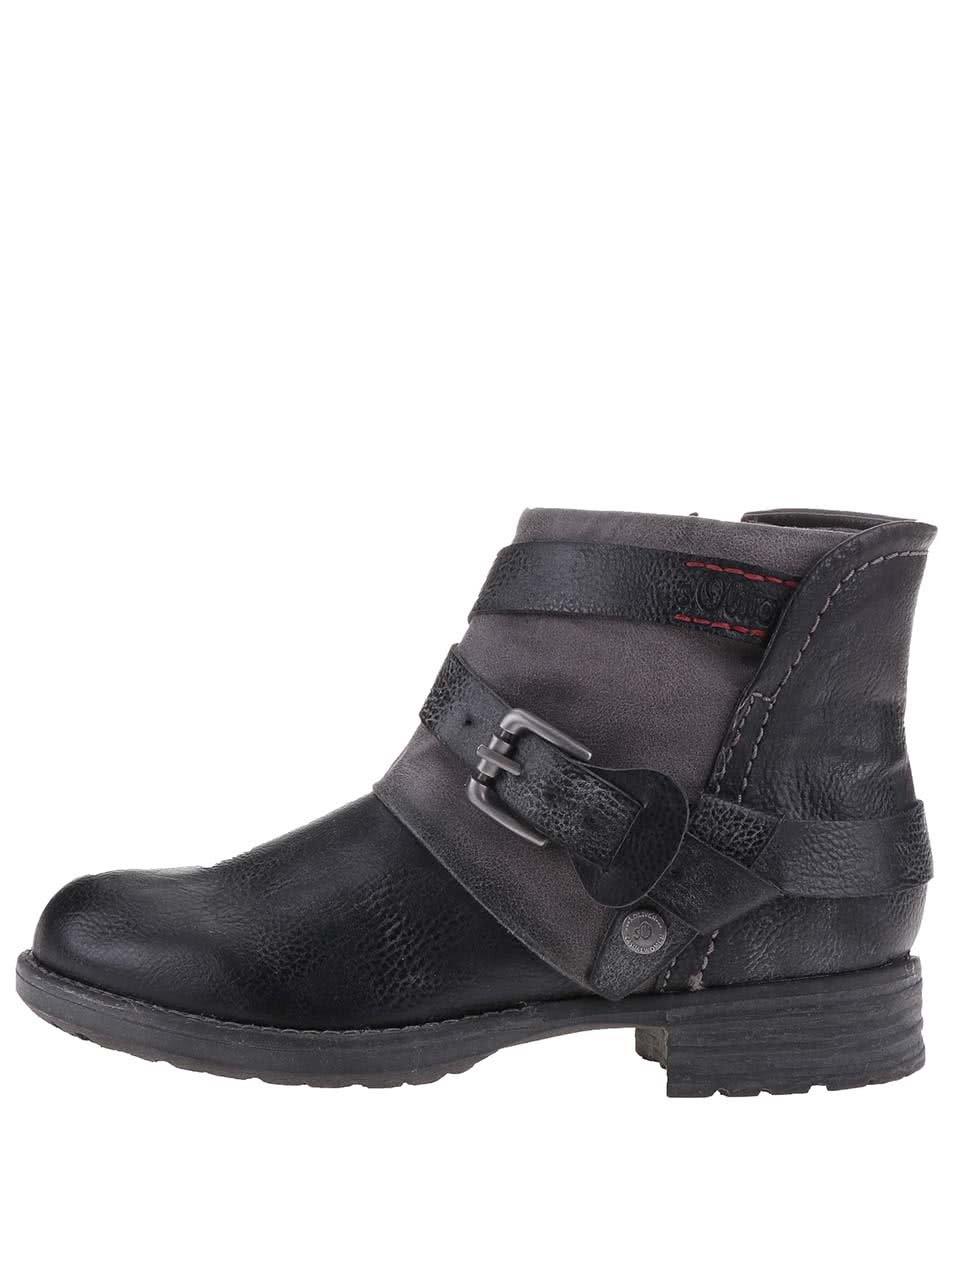 f2f92dc5ef1c9 Čierne dámske členkové topánky s prackou a remienkami s.Oliver | ZOOT.sk